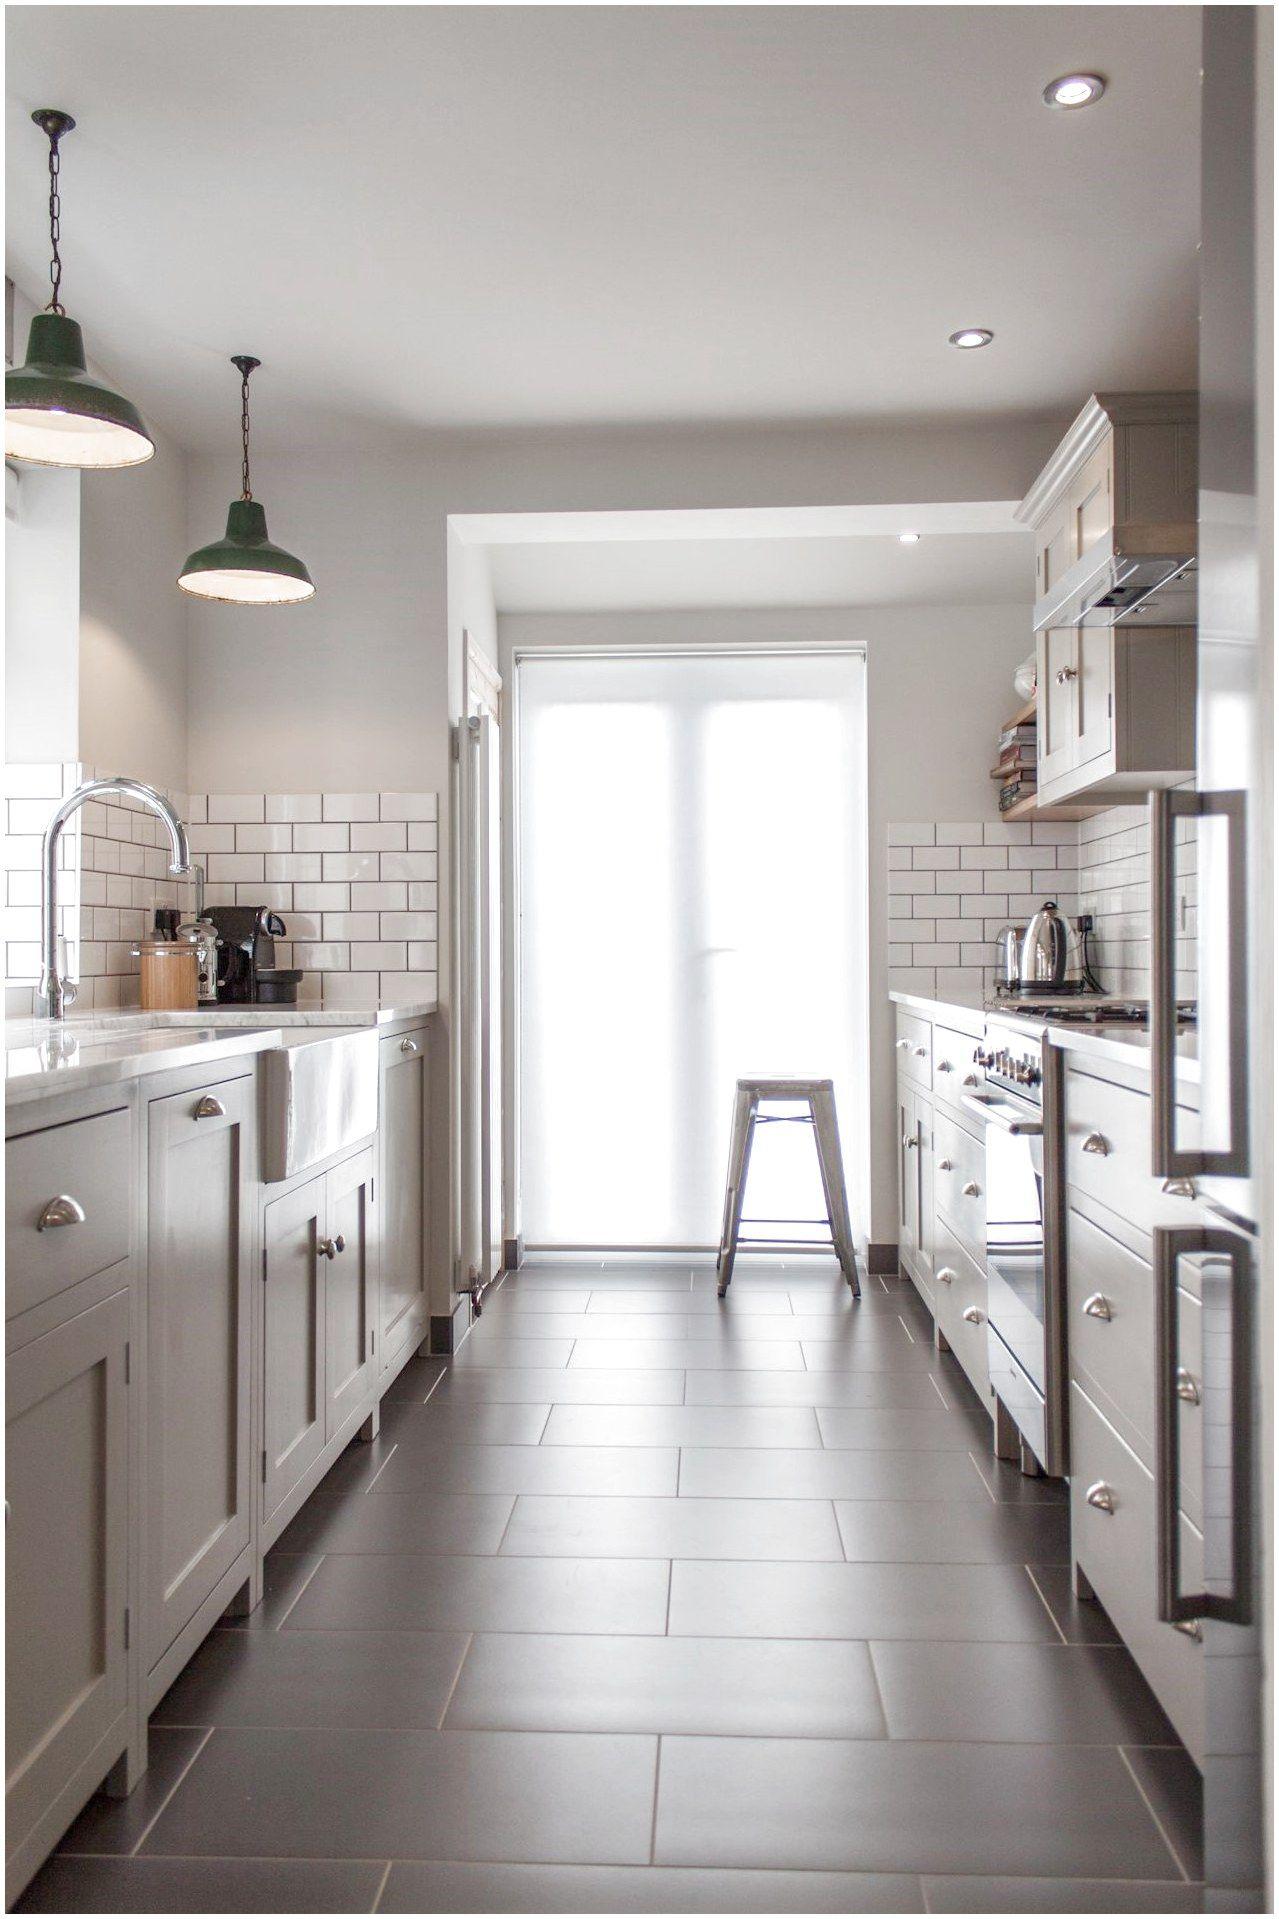 Different Designs For Your Floor Using Ceramics Galley Kitchen Design Trendy Kitchen Tile Kitchen Layout